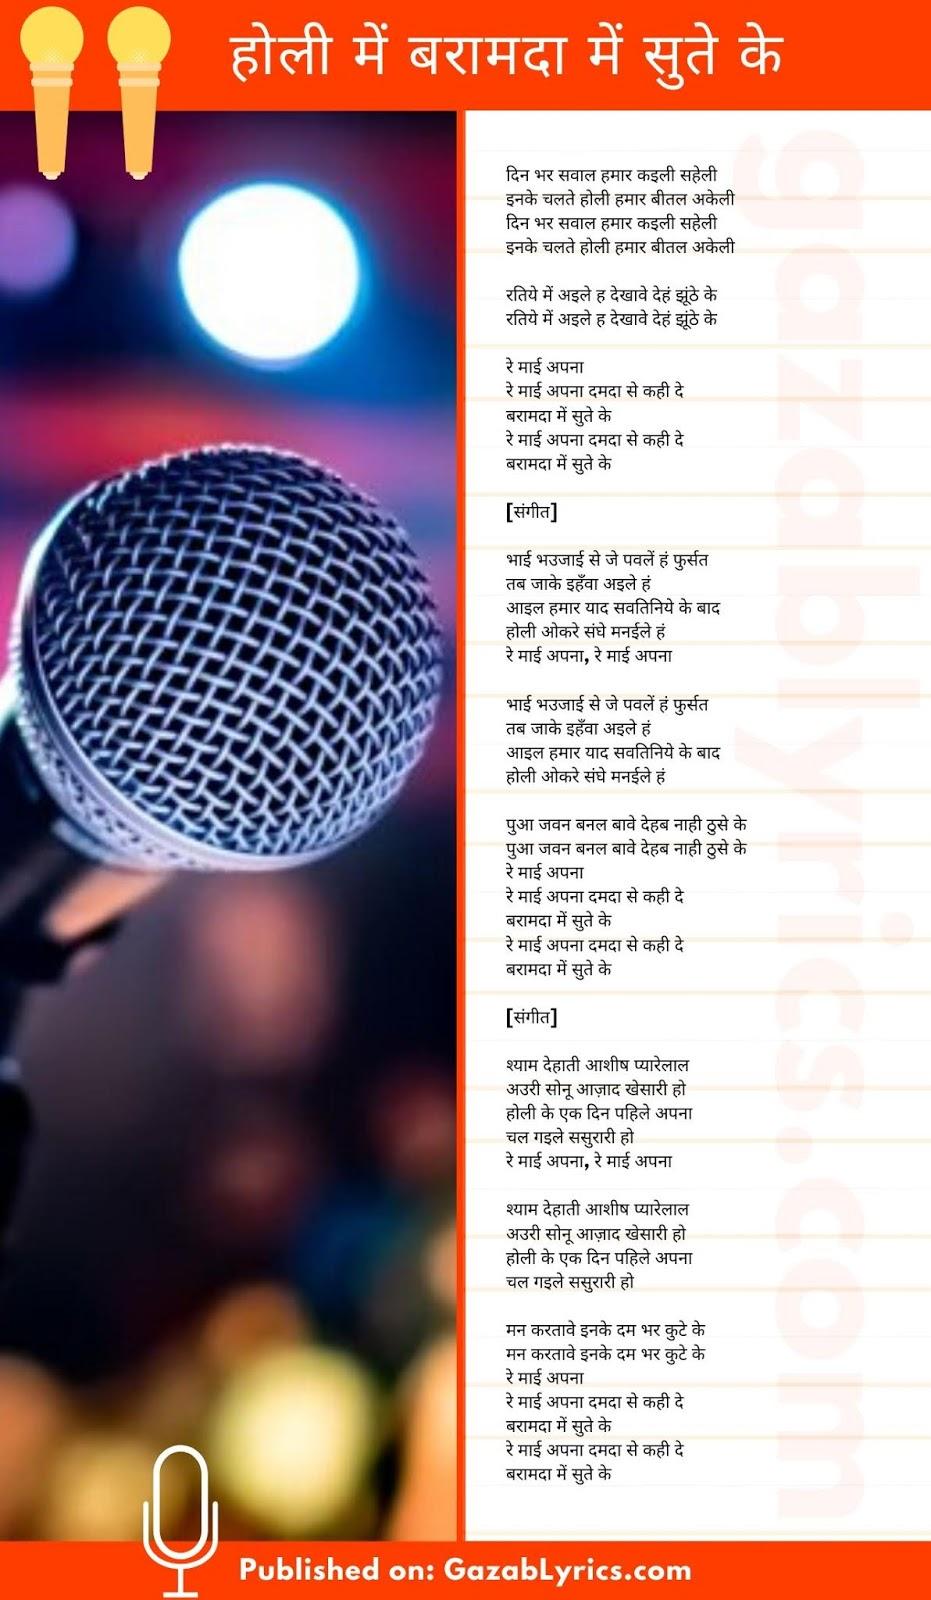 Holi Me Baramda Me Sute Ke song lyrics image